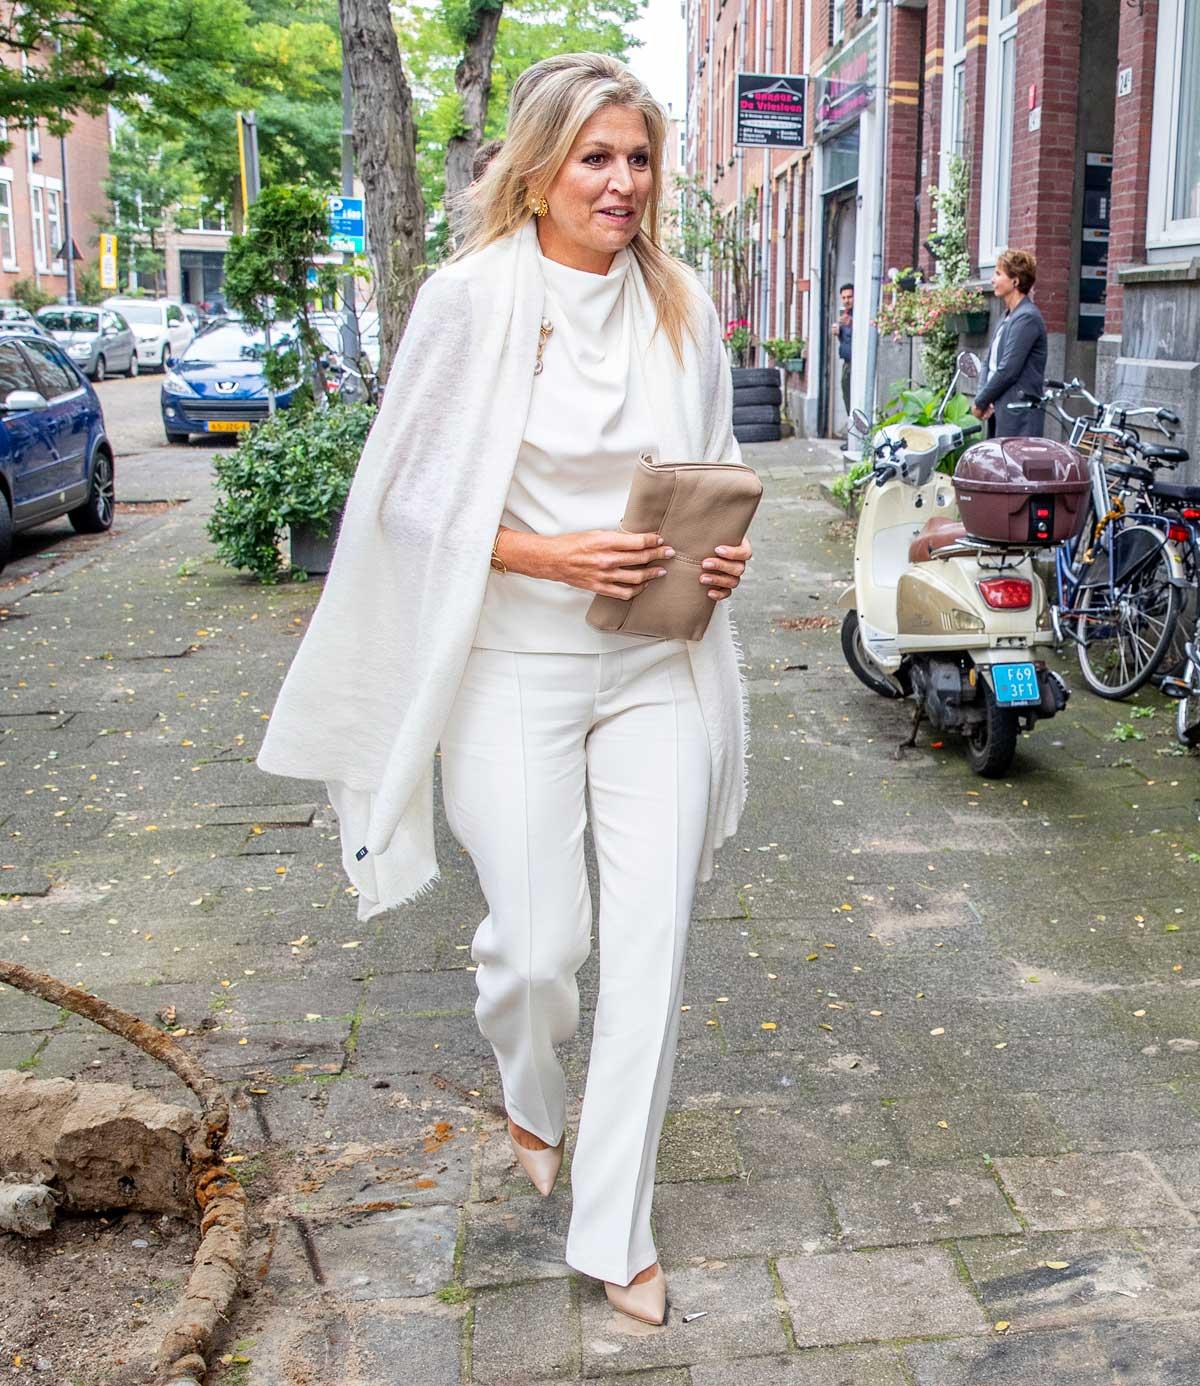 Maxima de Holanda